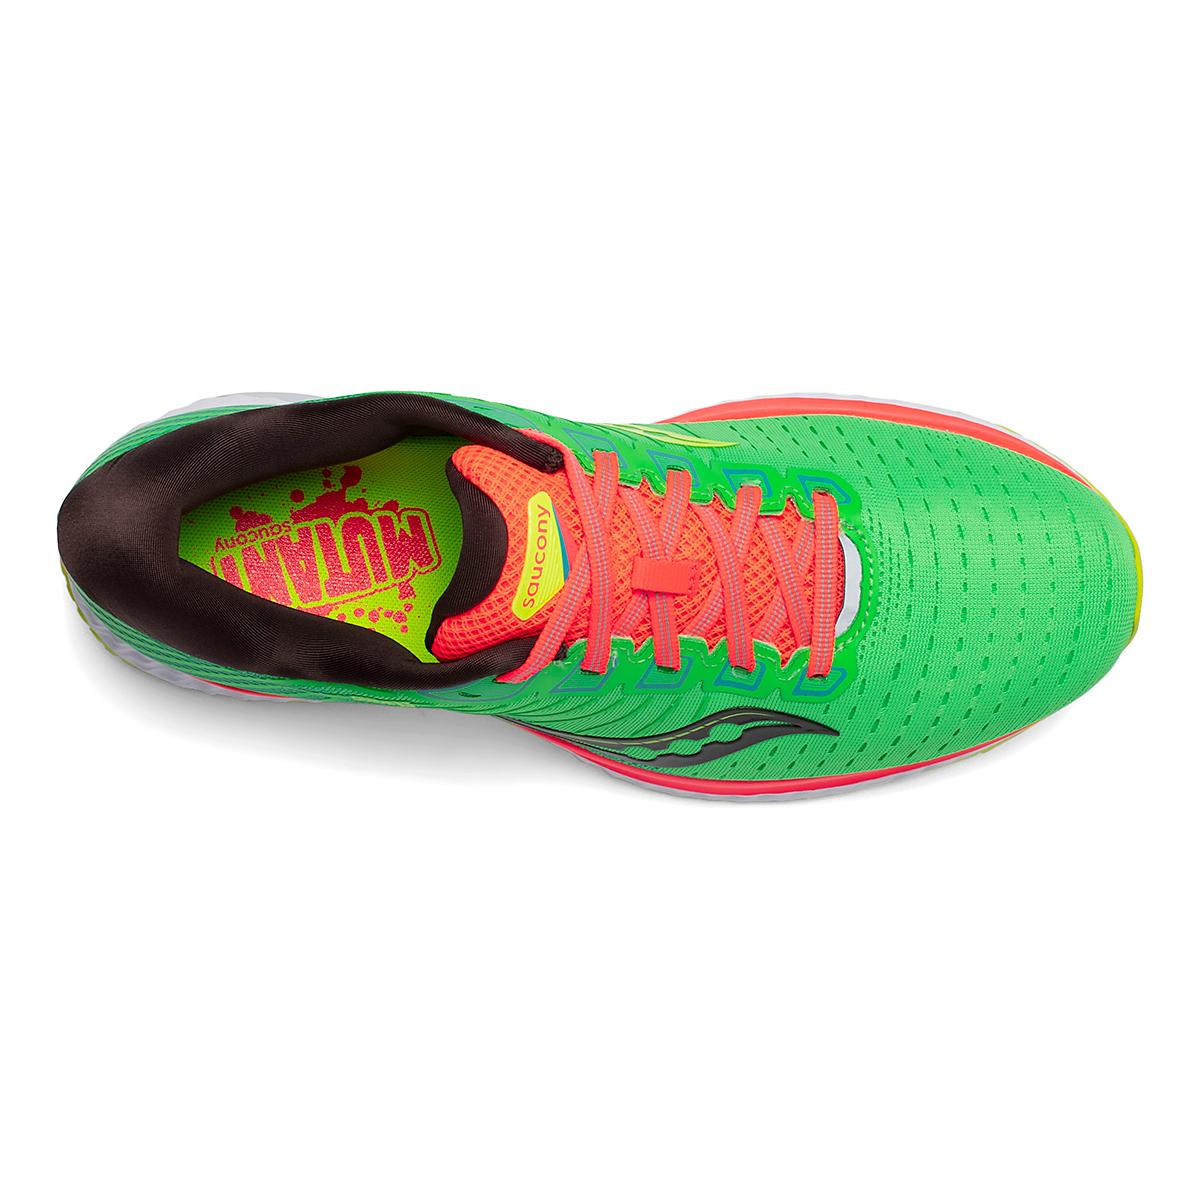 Men's Saucony Guide 13 Running Shoe - Color: Green Mutant - Size: 7 - Width: Regular, Green Mutant, large, image 3